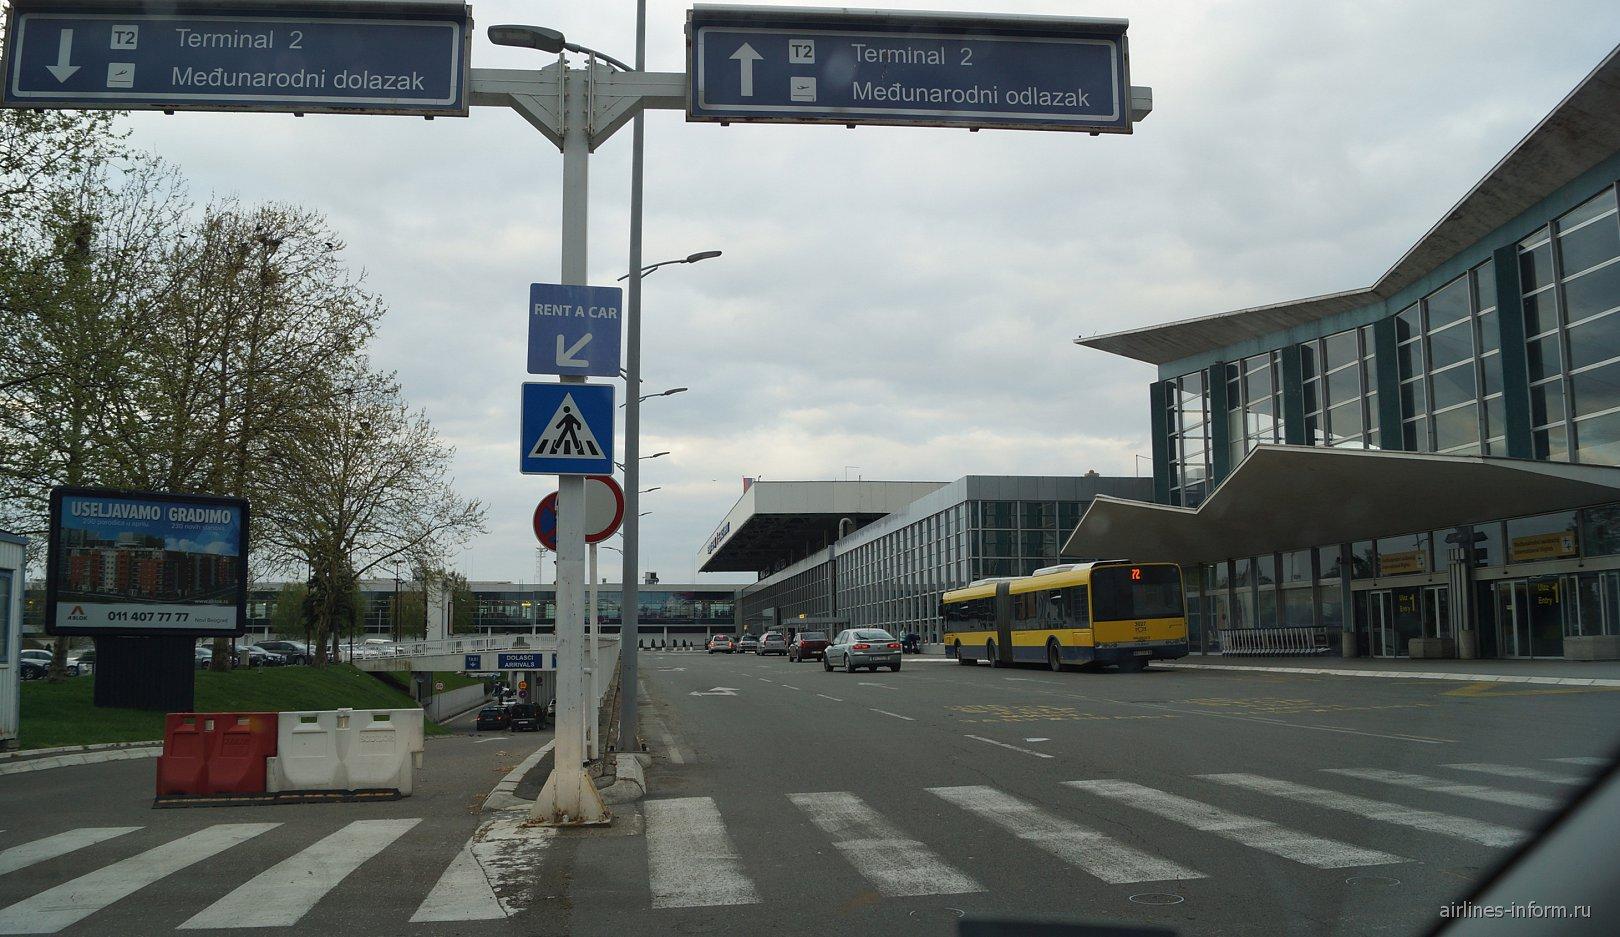 Пассажирские терминалы аэропорта Белград Никола Тесла